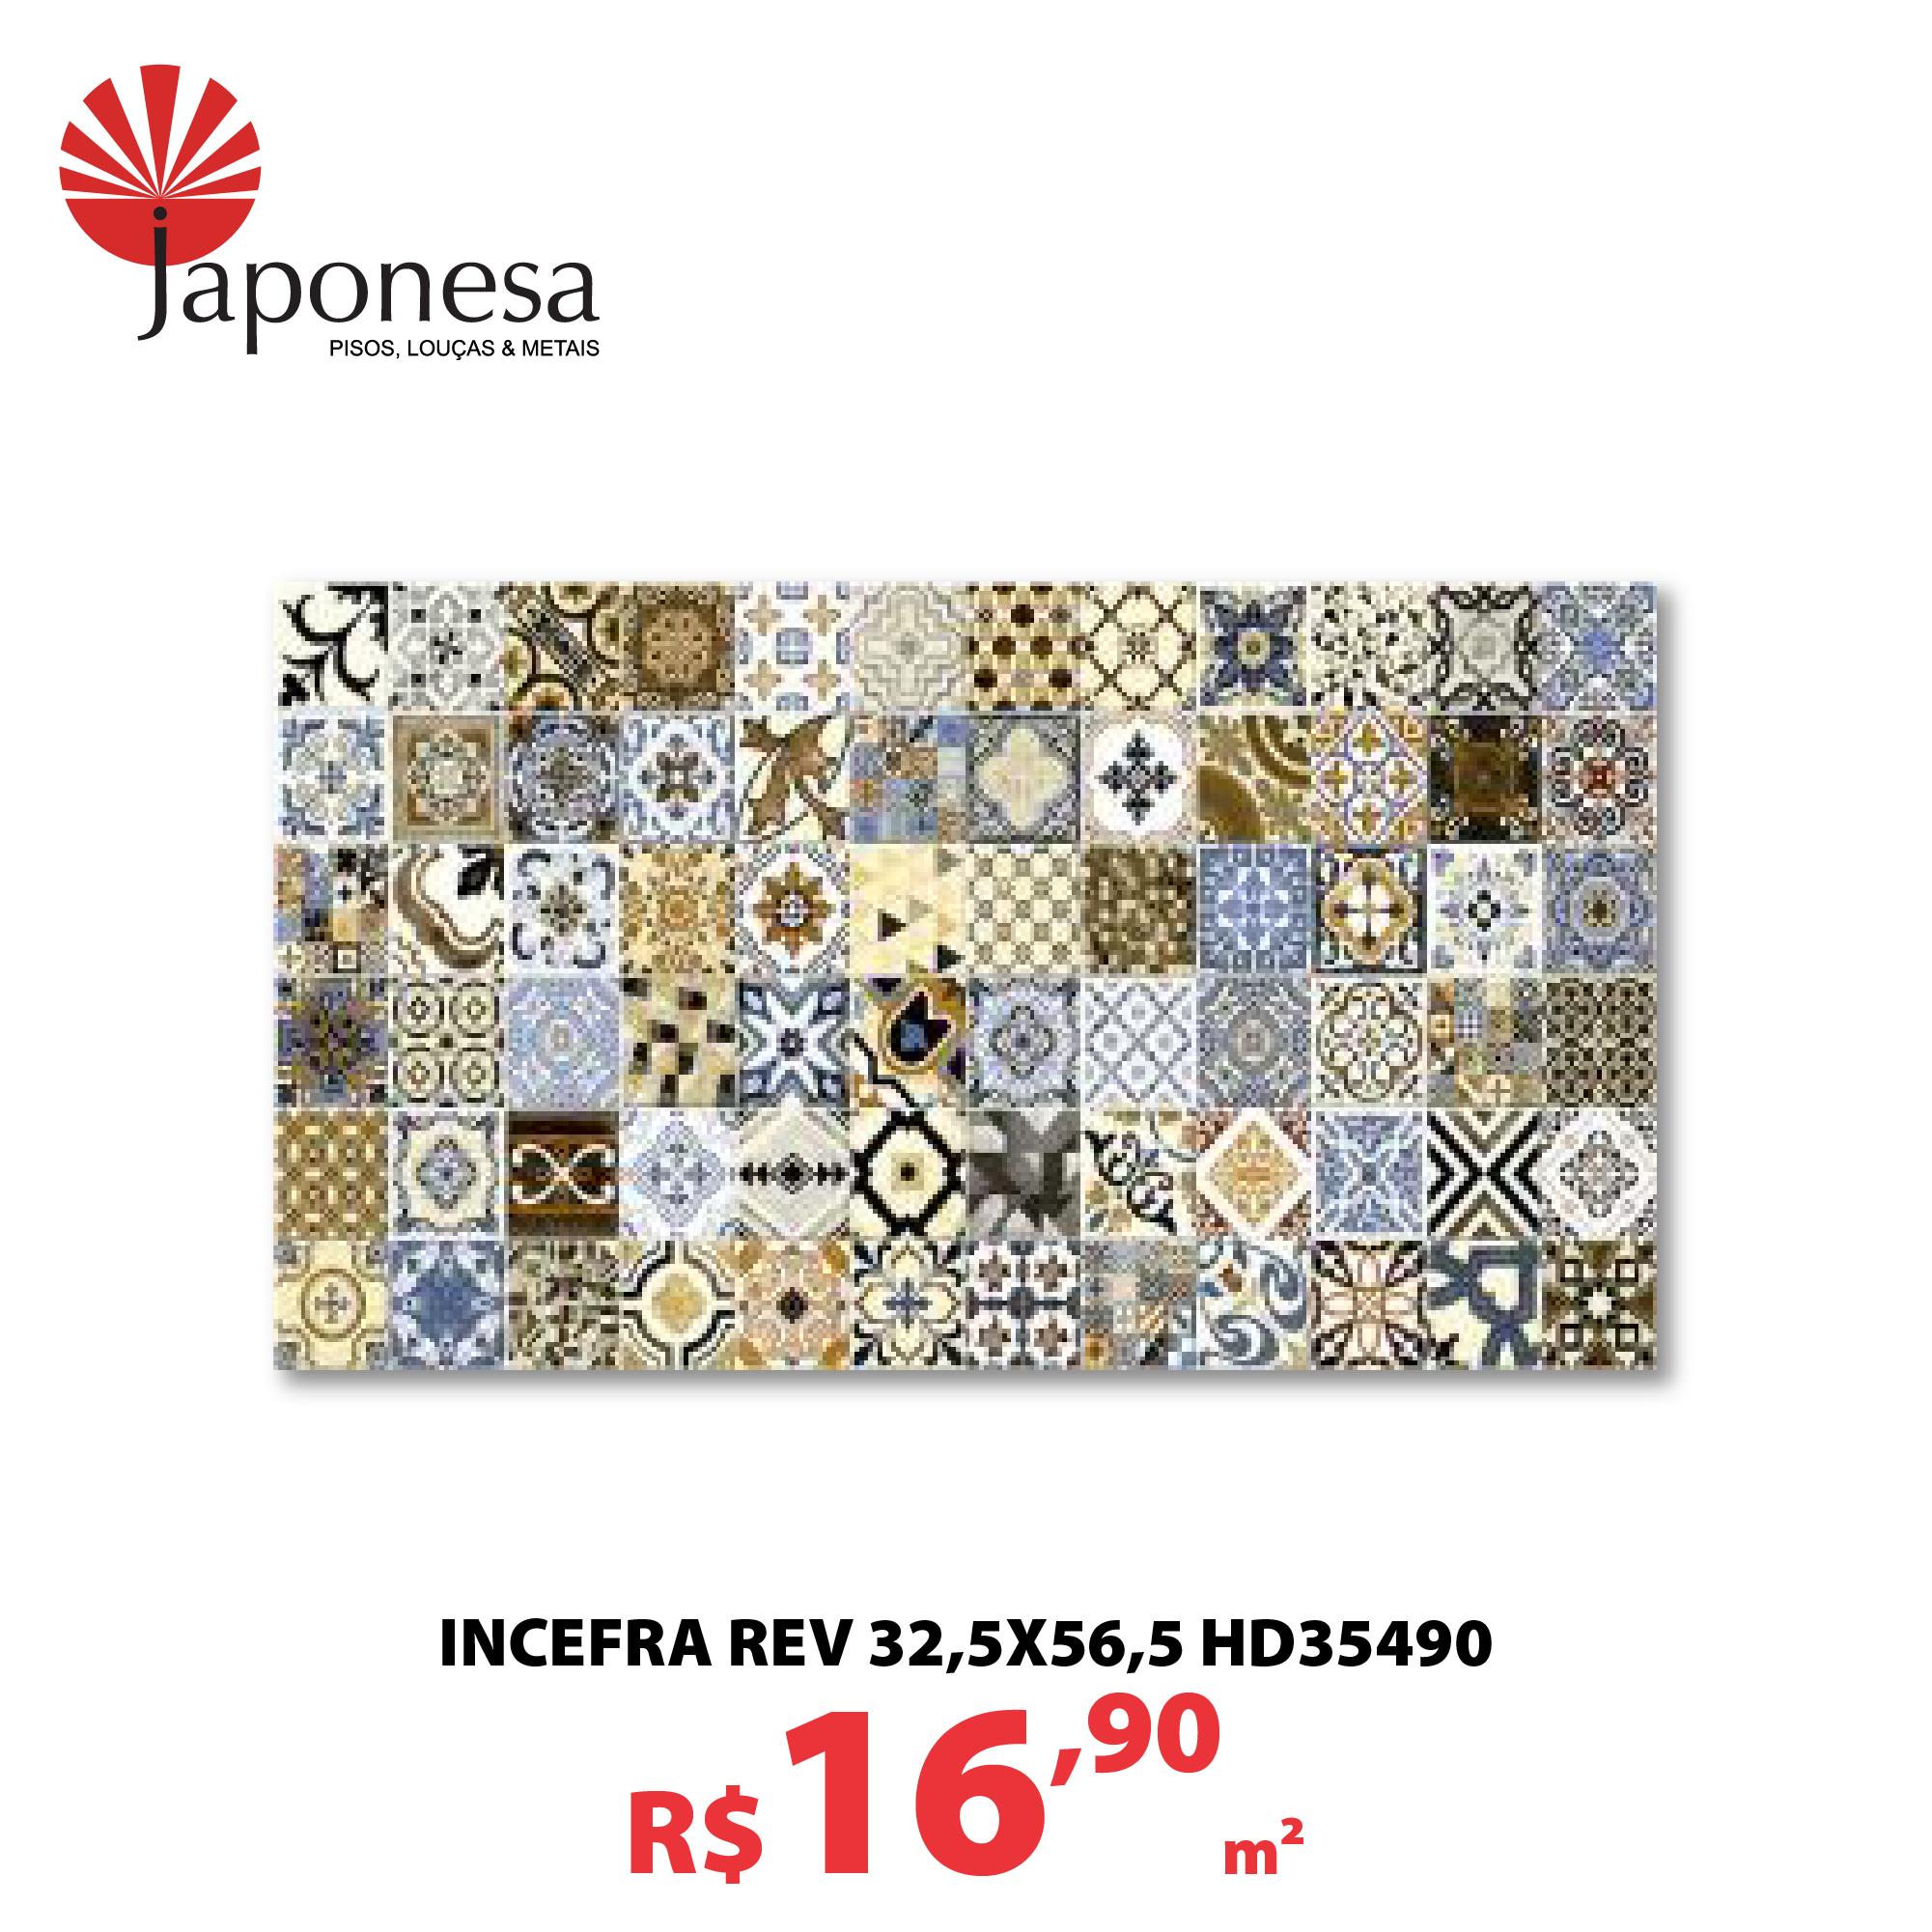 INCEFRA REV 32,5X56,5 HD35490